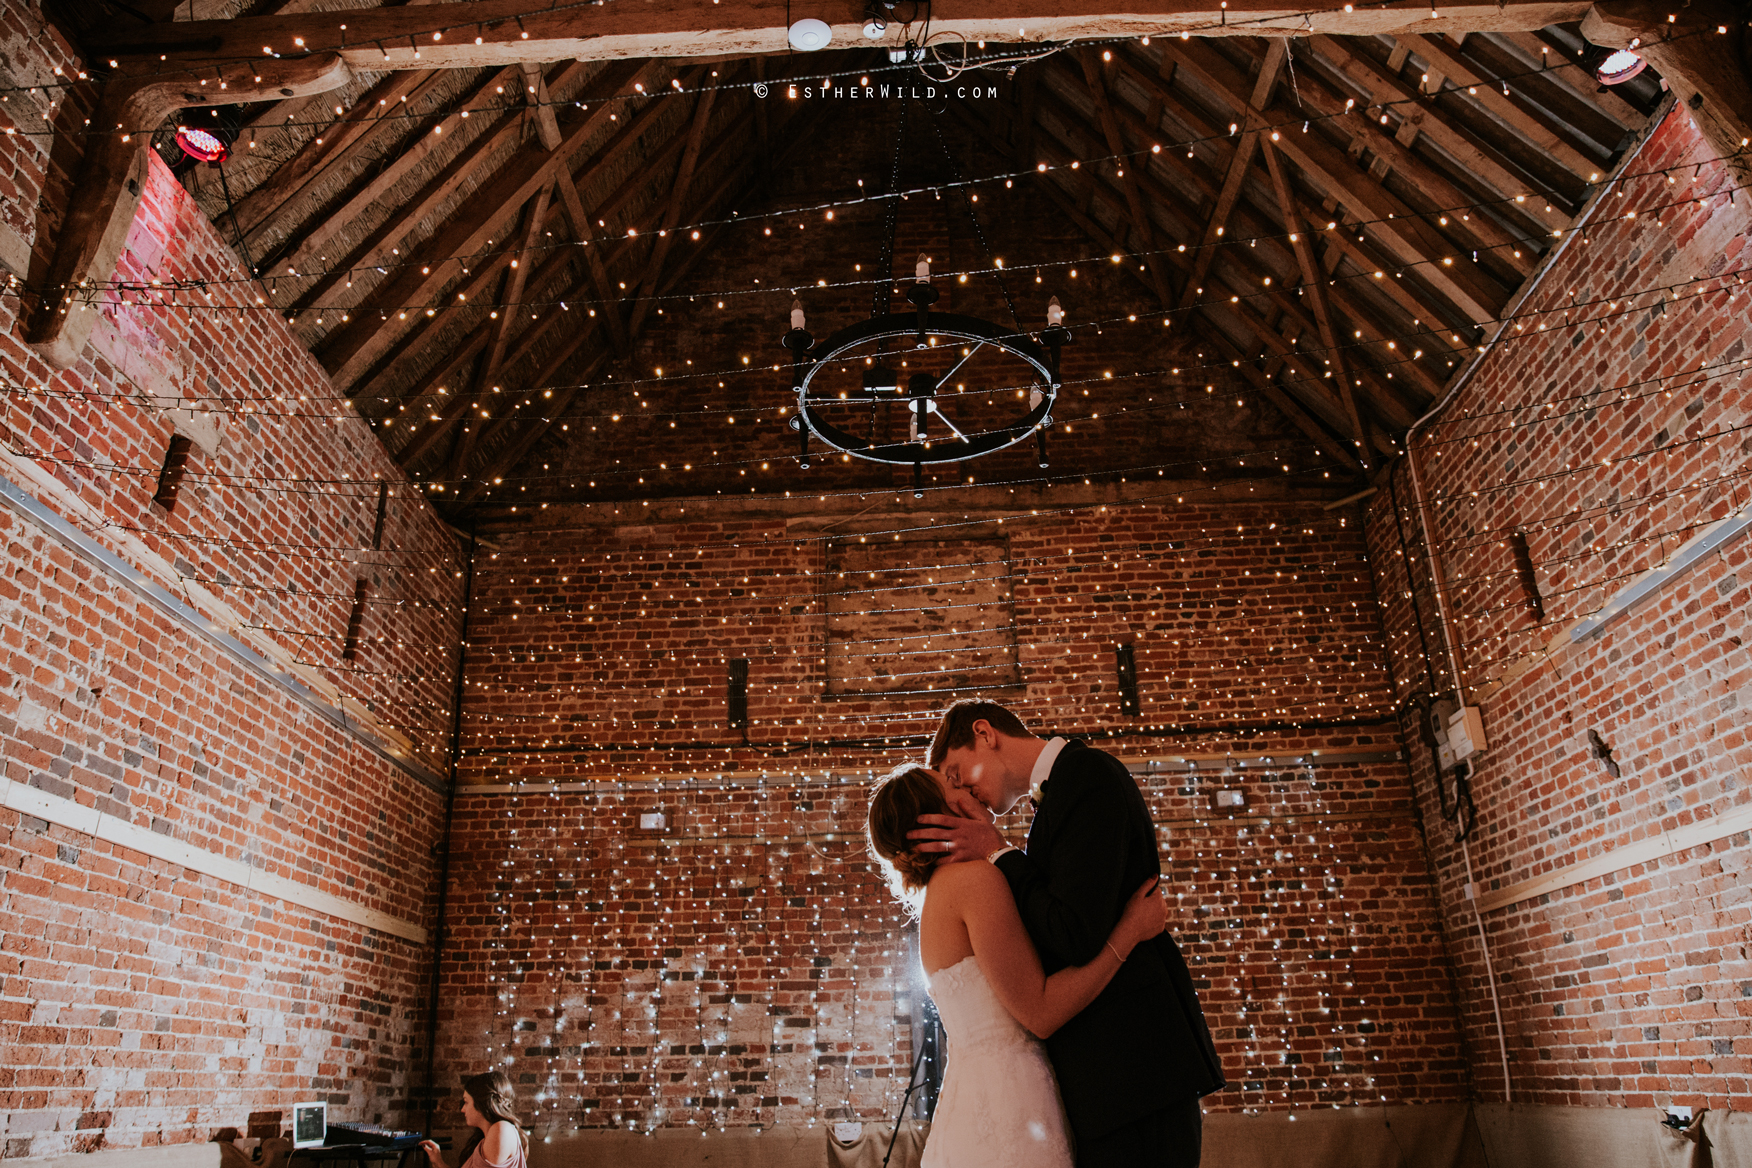 Glebe_Farm_Barn_Rustic_Norfolk_Wedding_Esther_Wild_Photographer_Copyright_IMG_2830.jpg